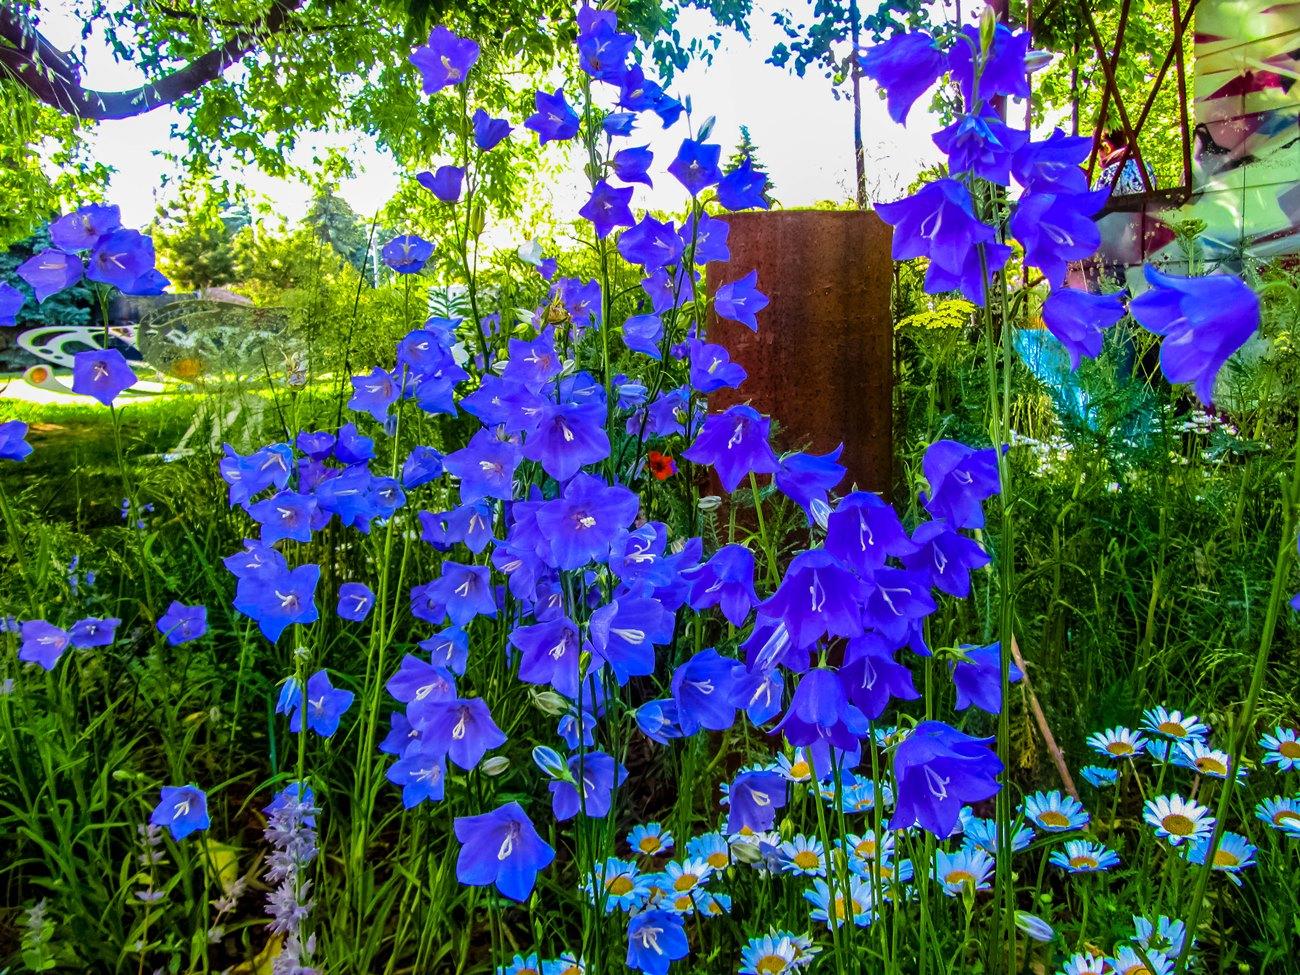 irina-fortuna-moscow-flowers 01.jpg